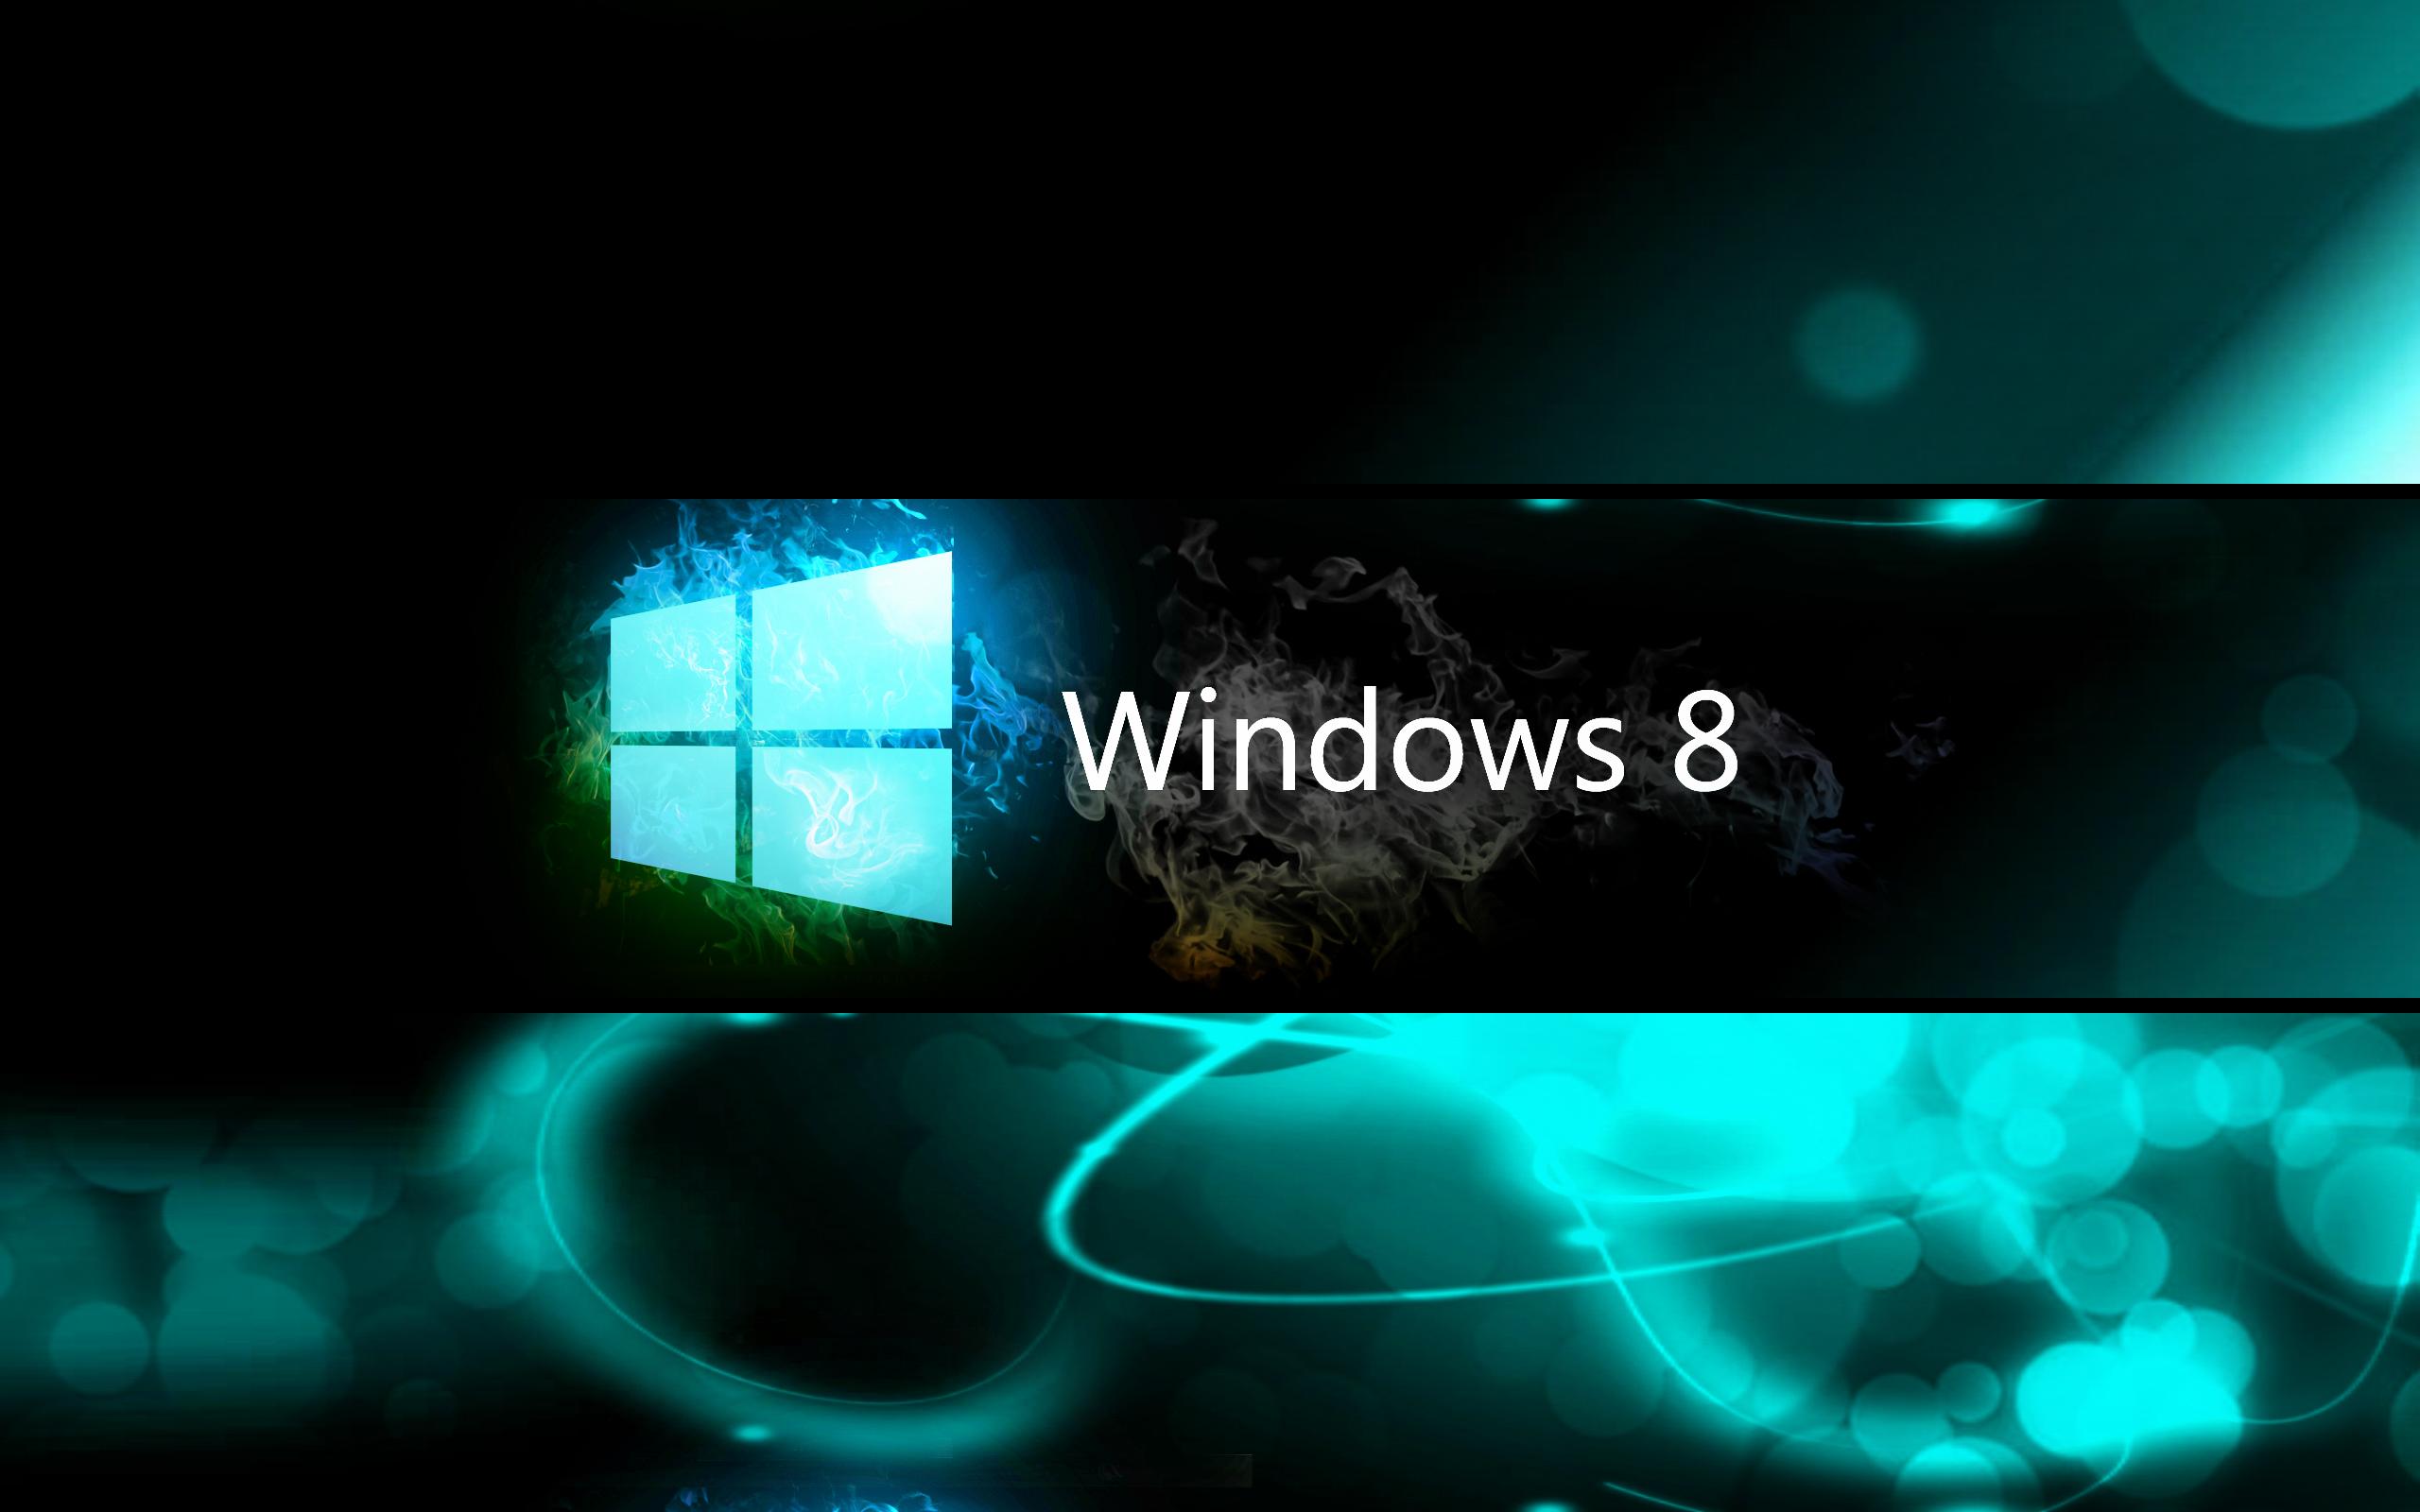 windows 8 photos windows 8 photos windows 8 photos windows 2560x1600